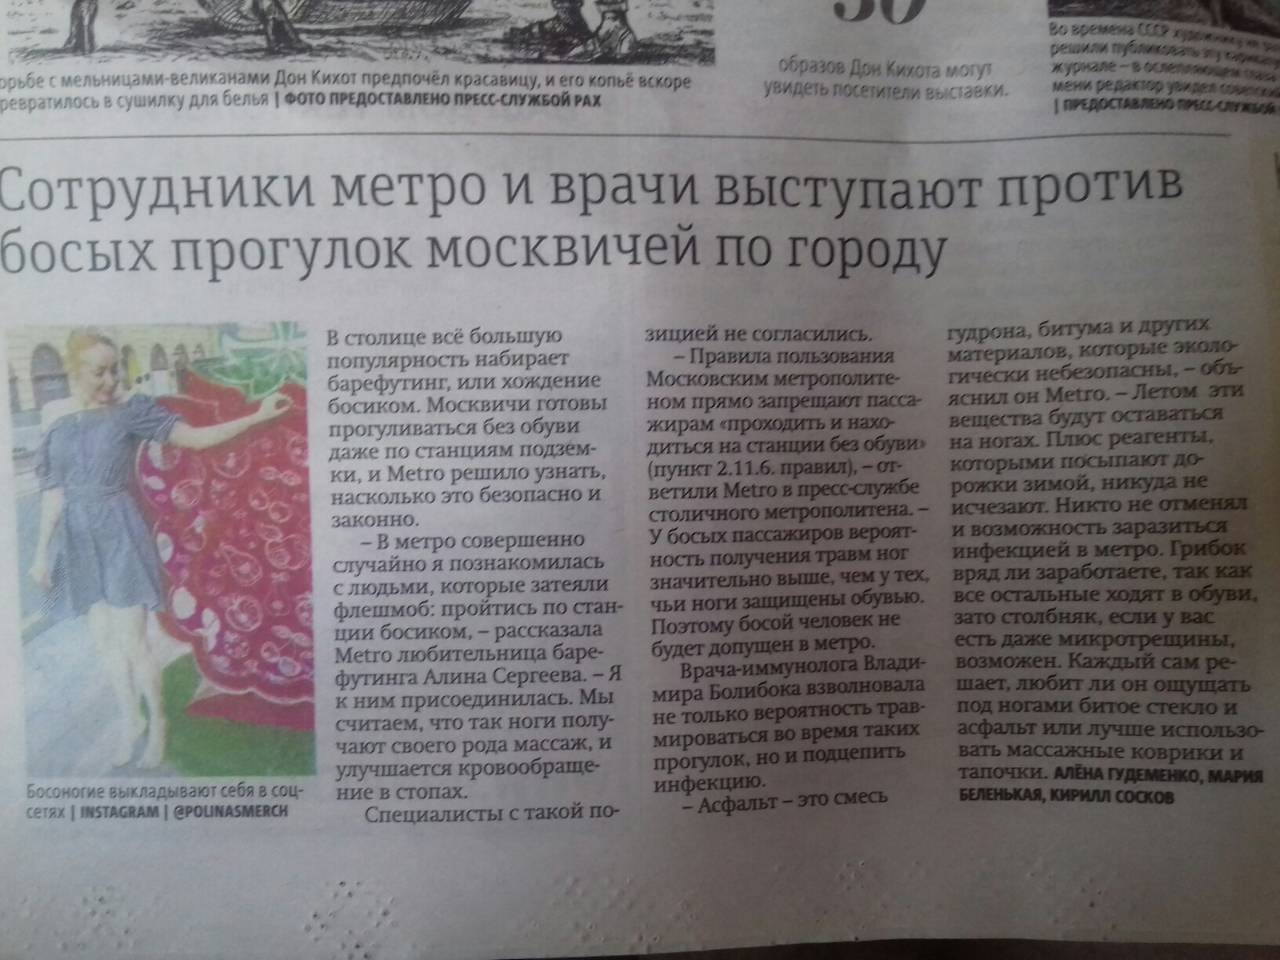 http://s7.uploads.ru/Nvszk.jpg